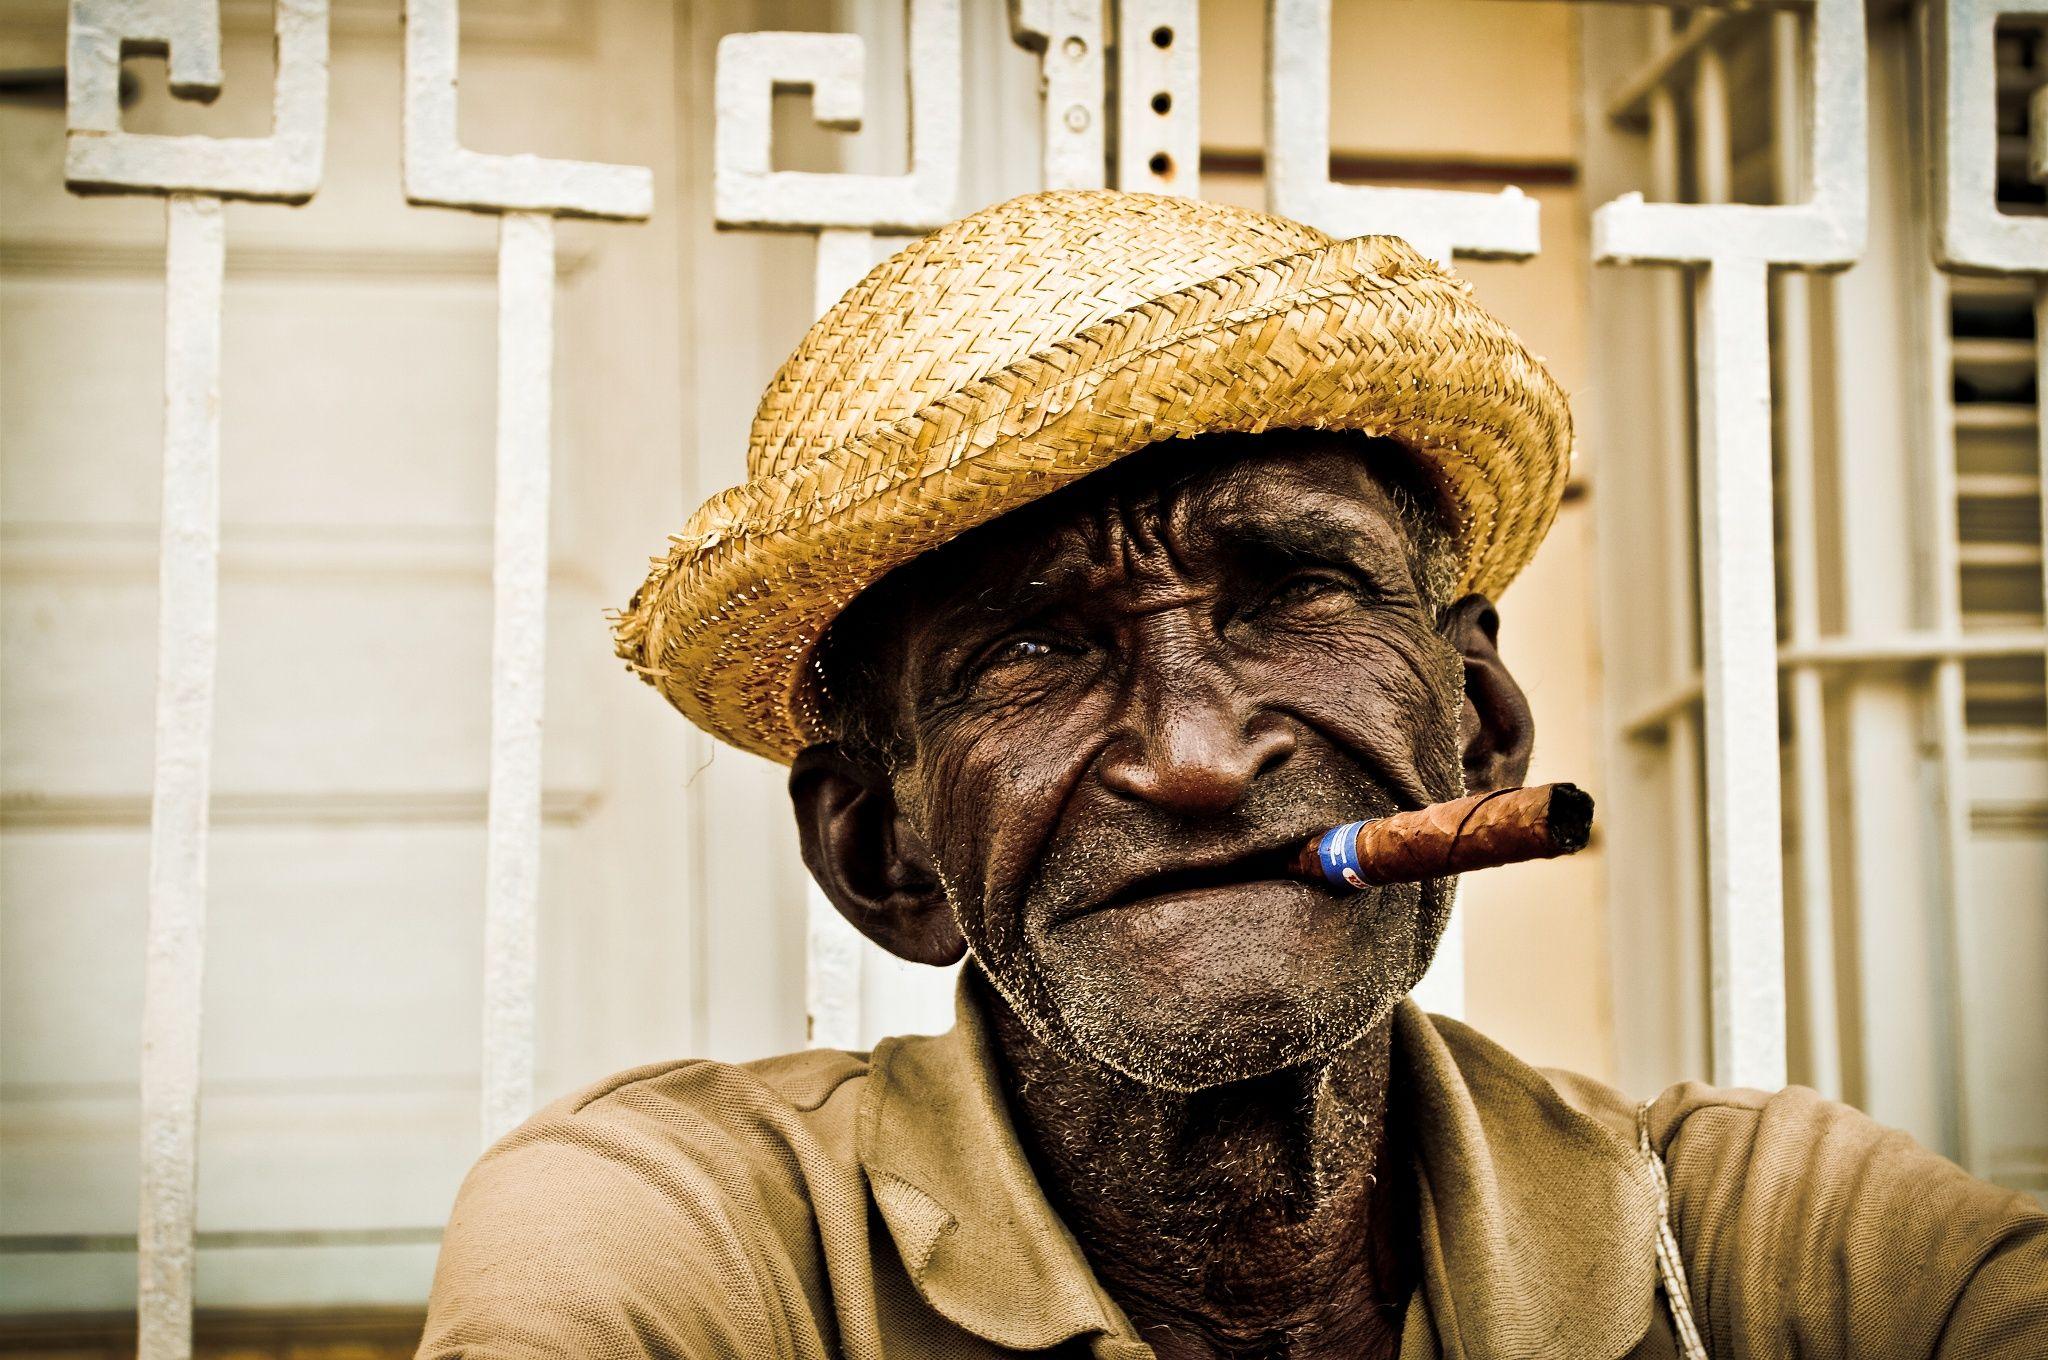 500px 上の Frank Neufeld の写真 Welcome to Cuba